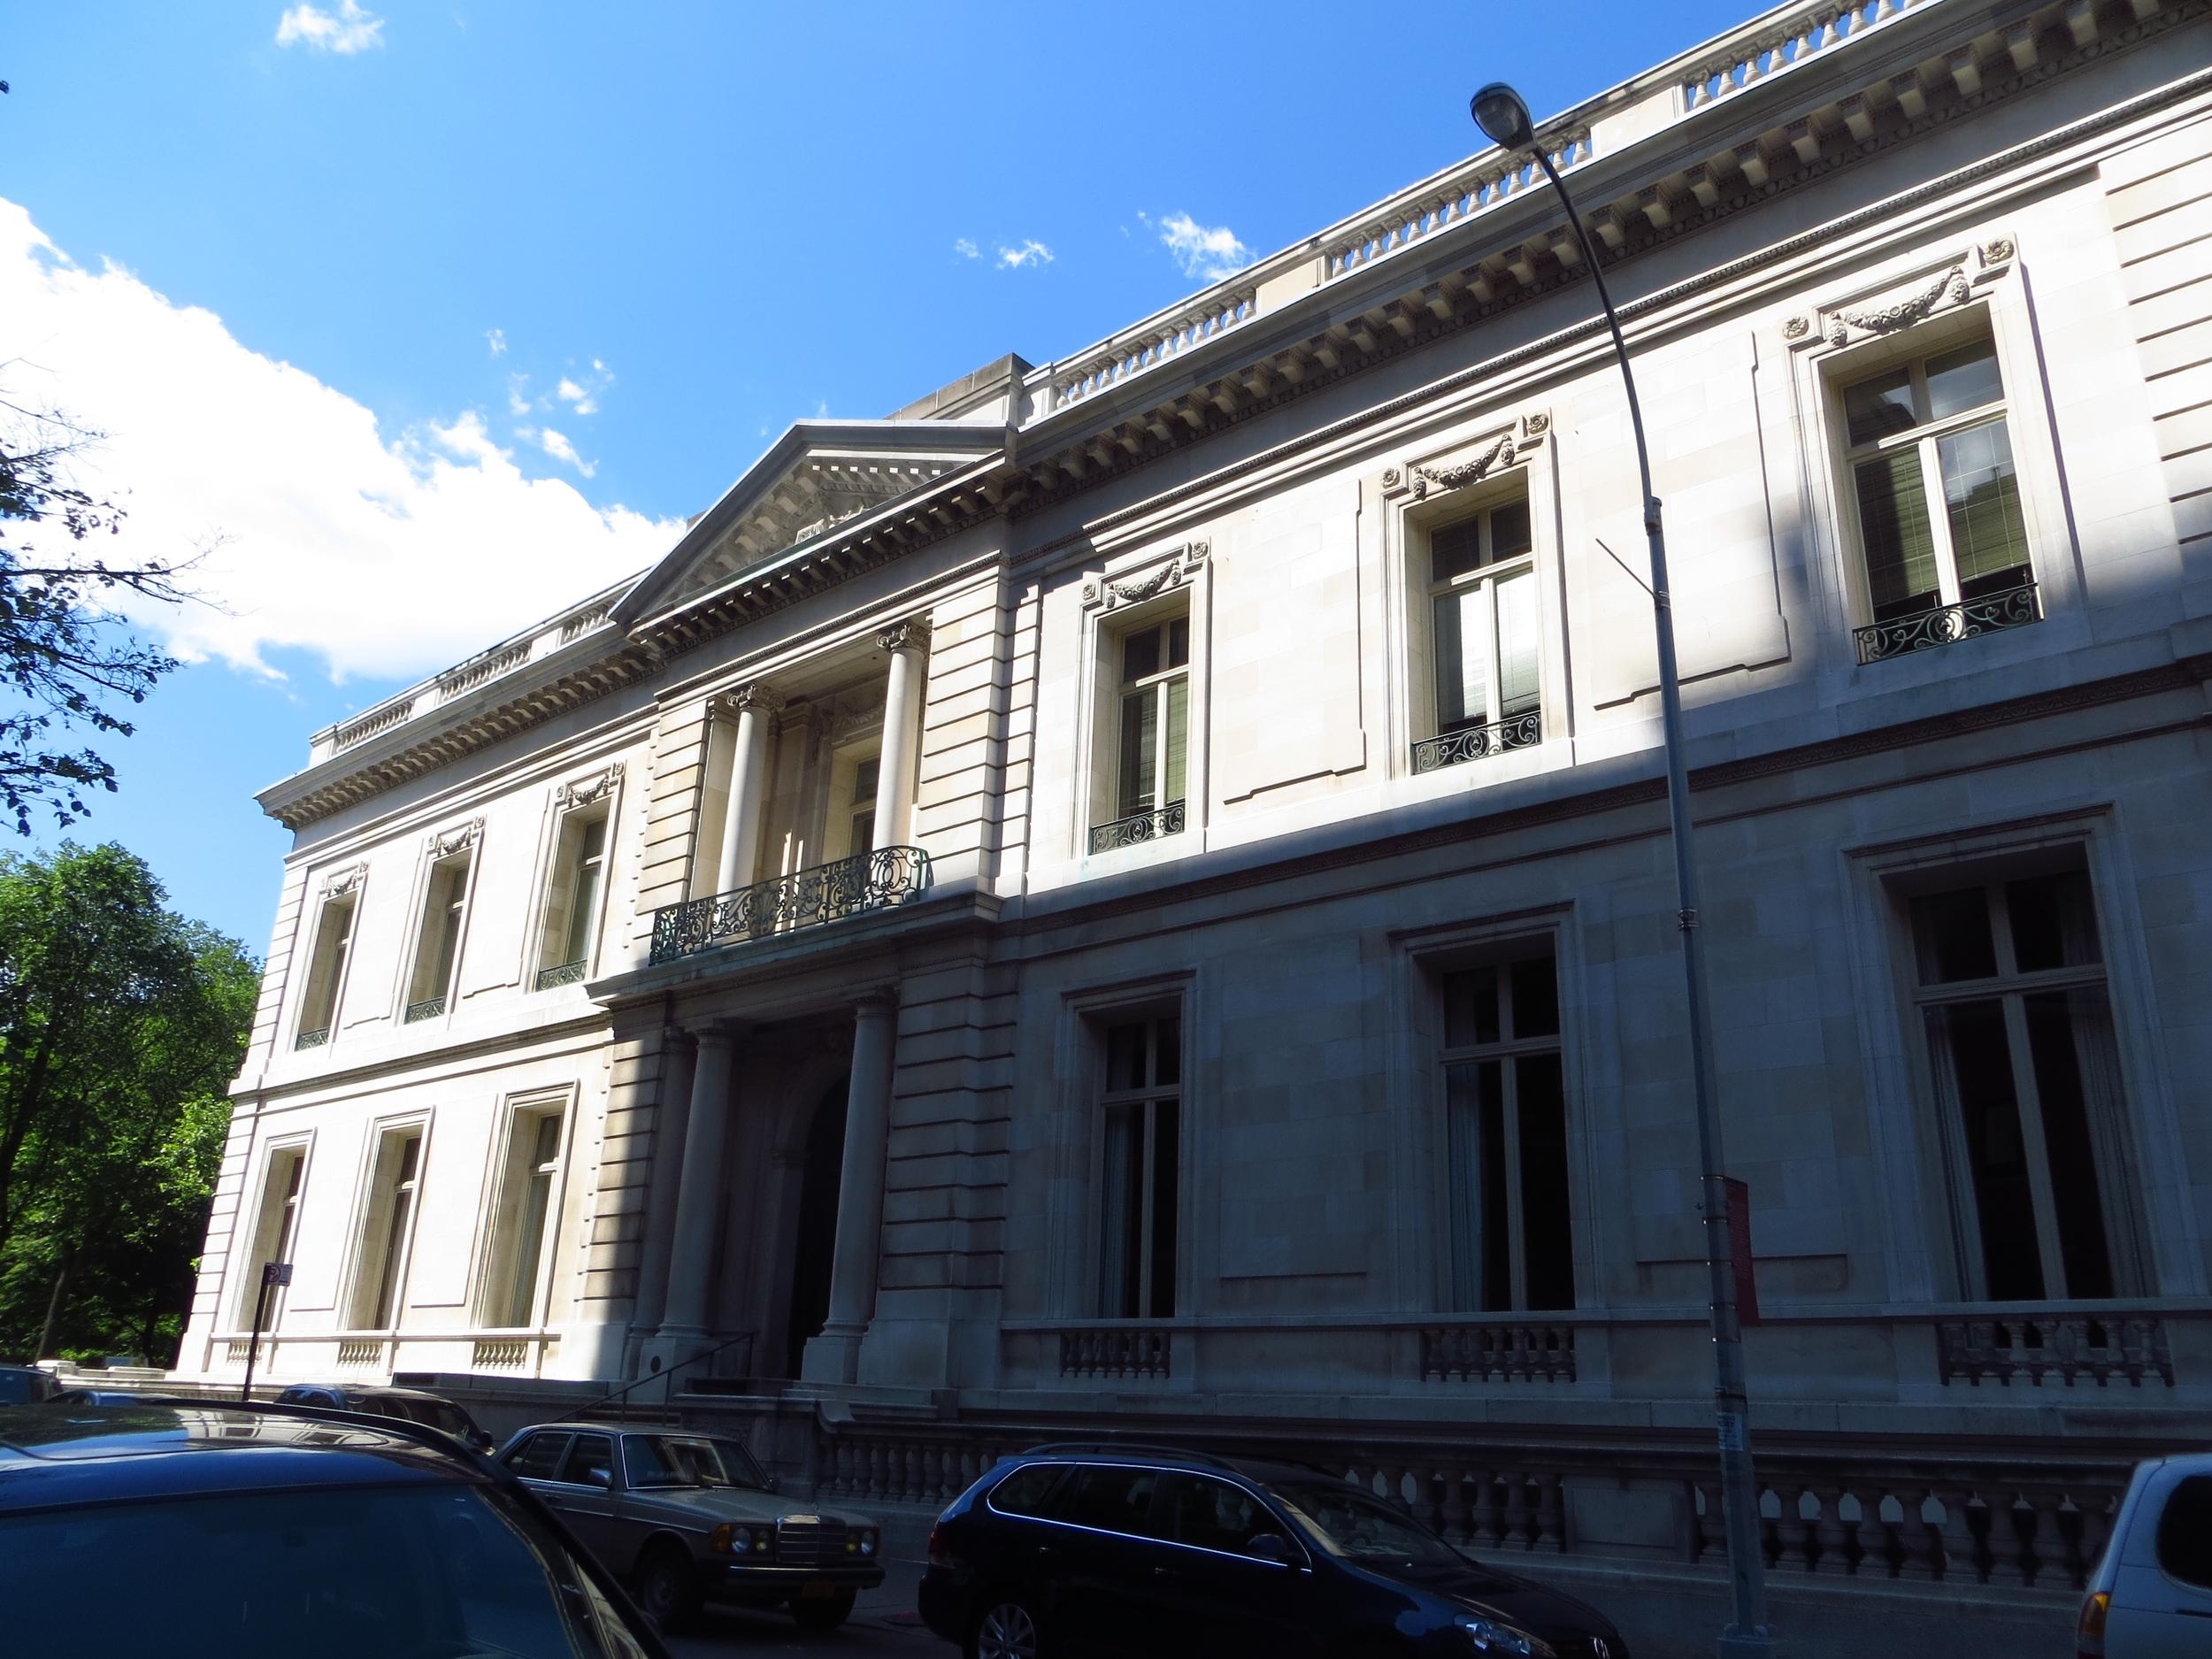 NYU Institute of Fine Arts in the James B. Duke House, as in Duke University (b. 1912)